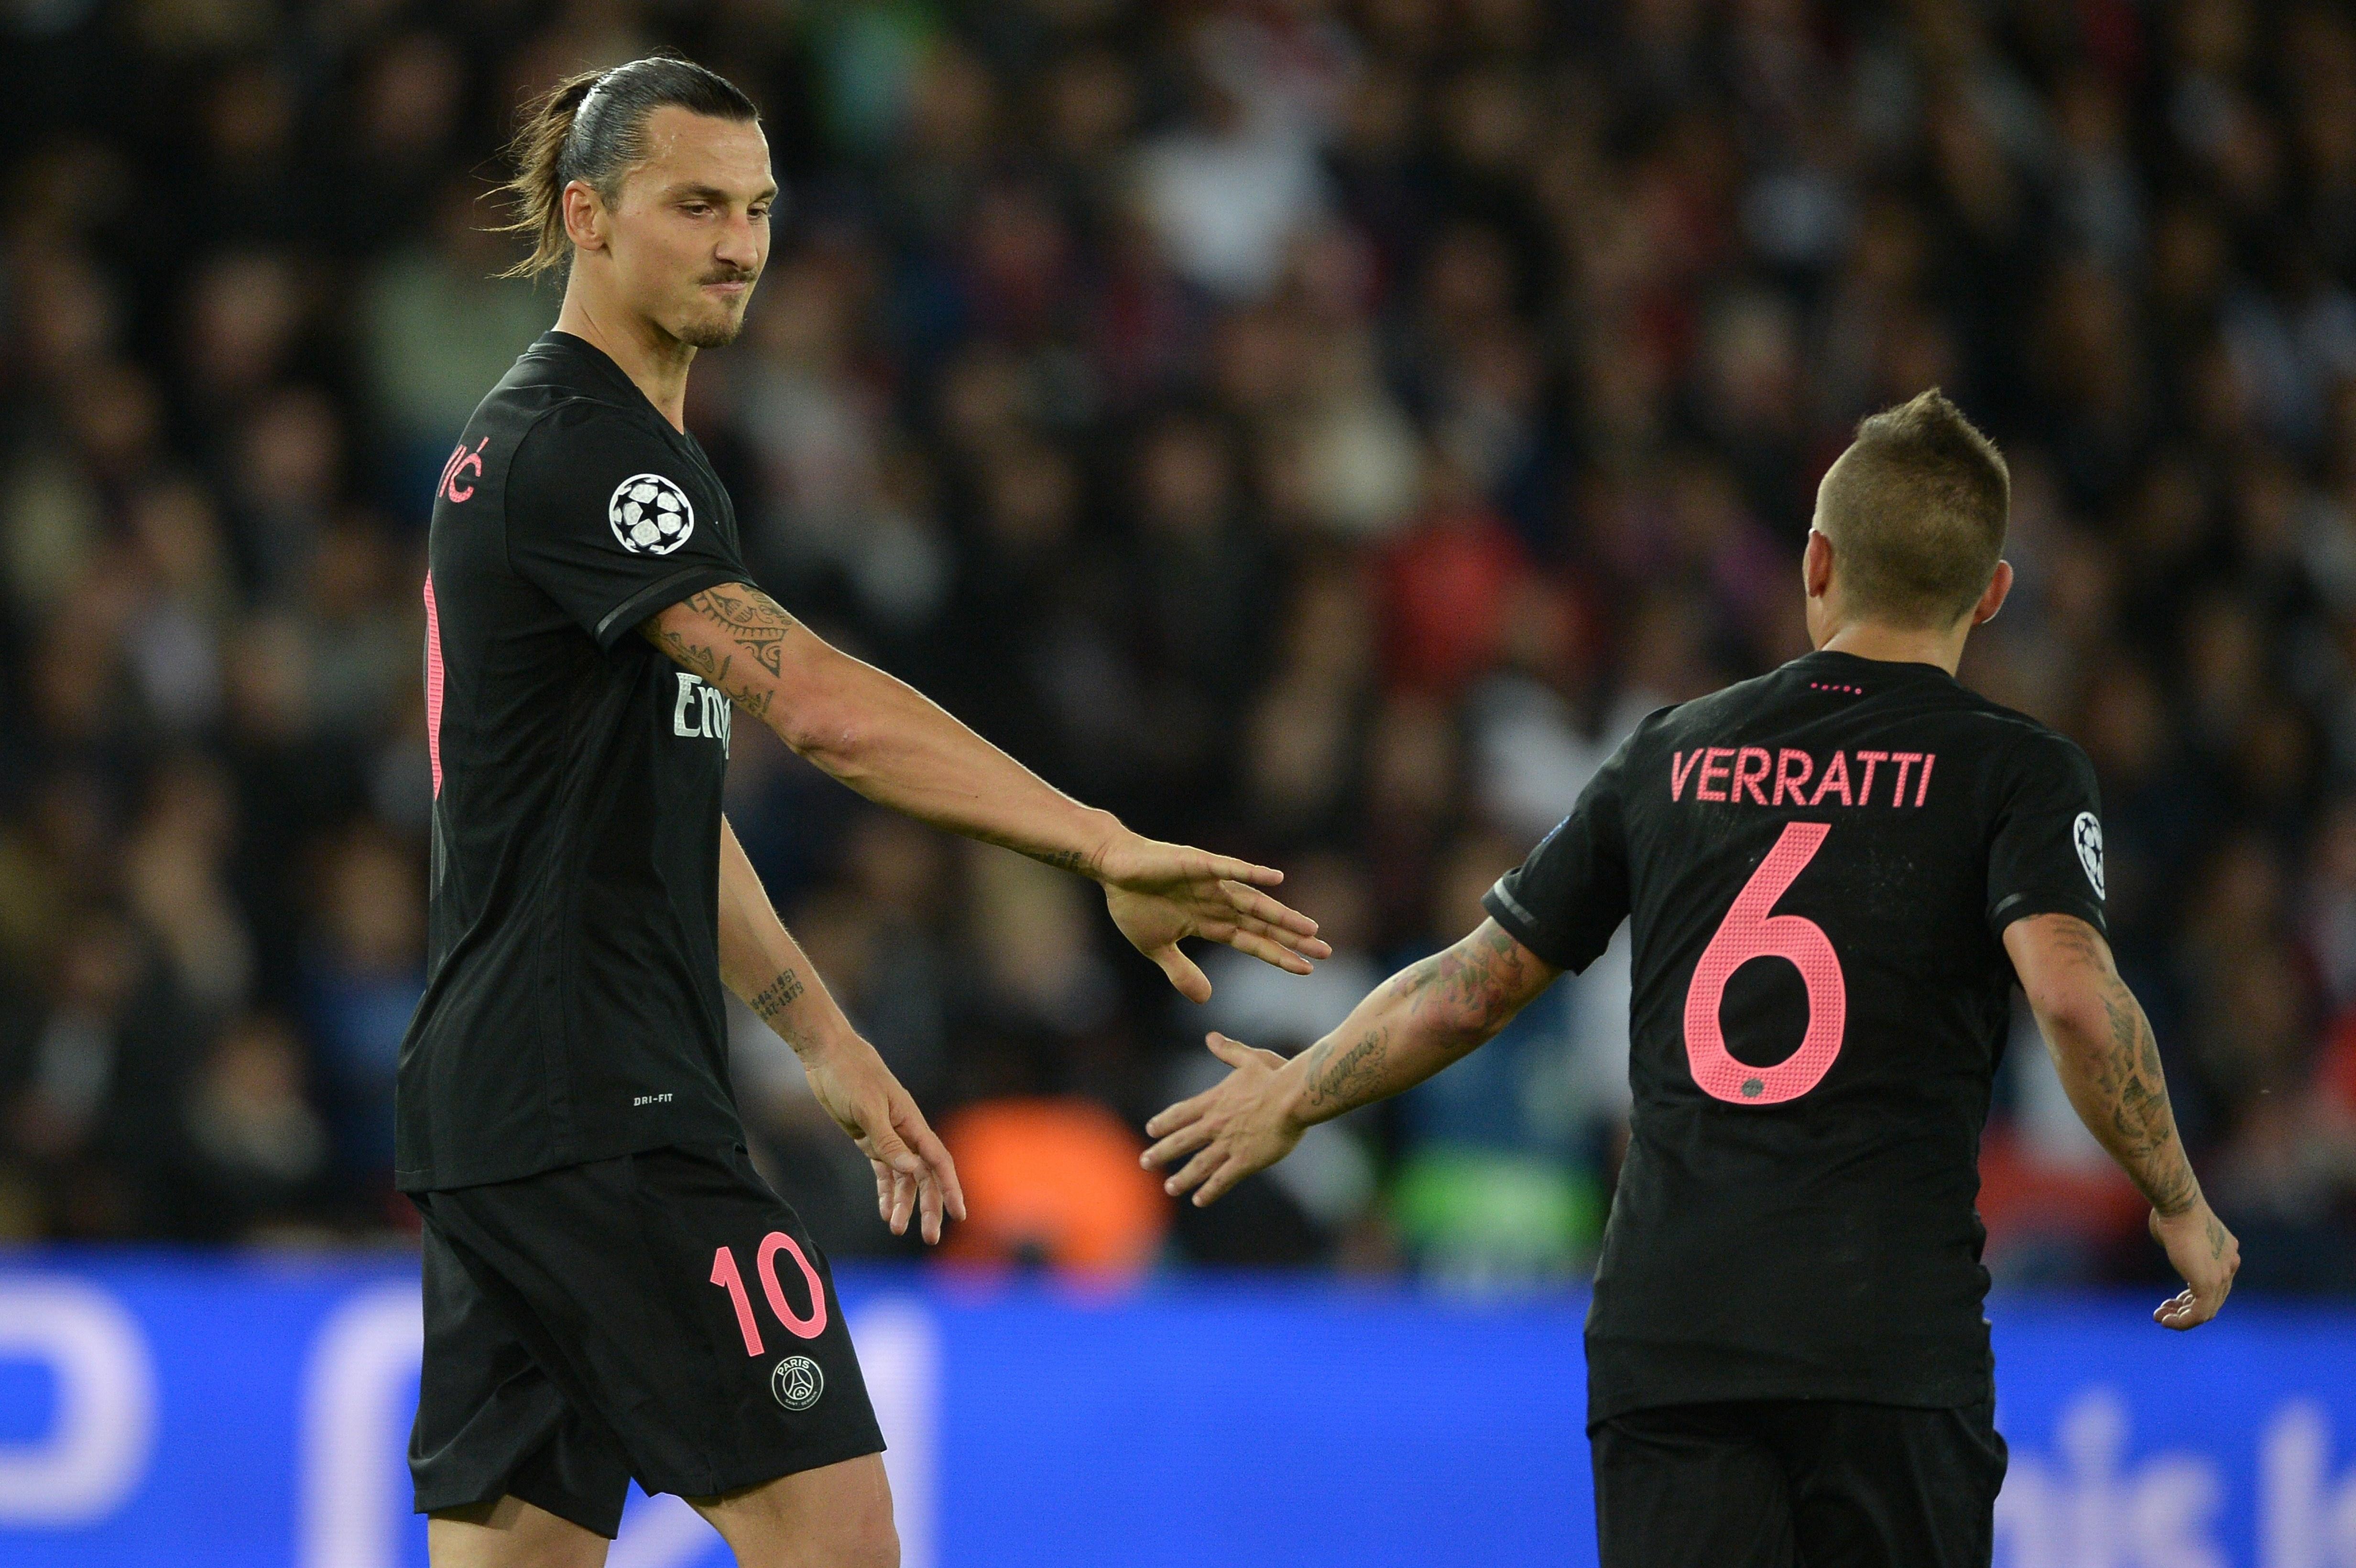 Verratti Ibrahimovic